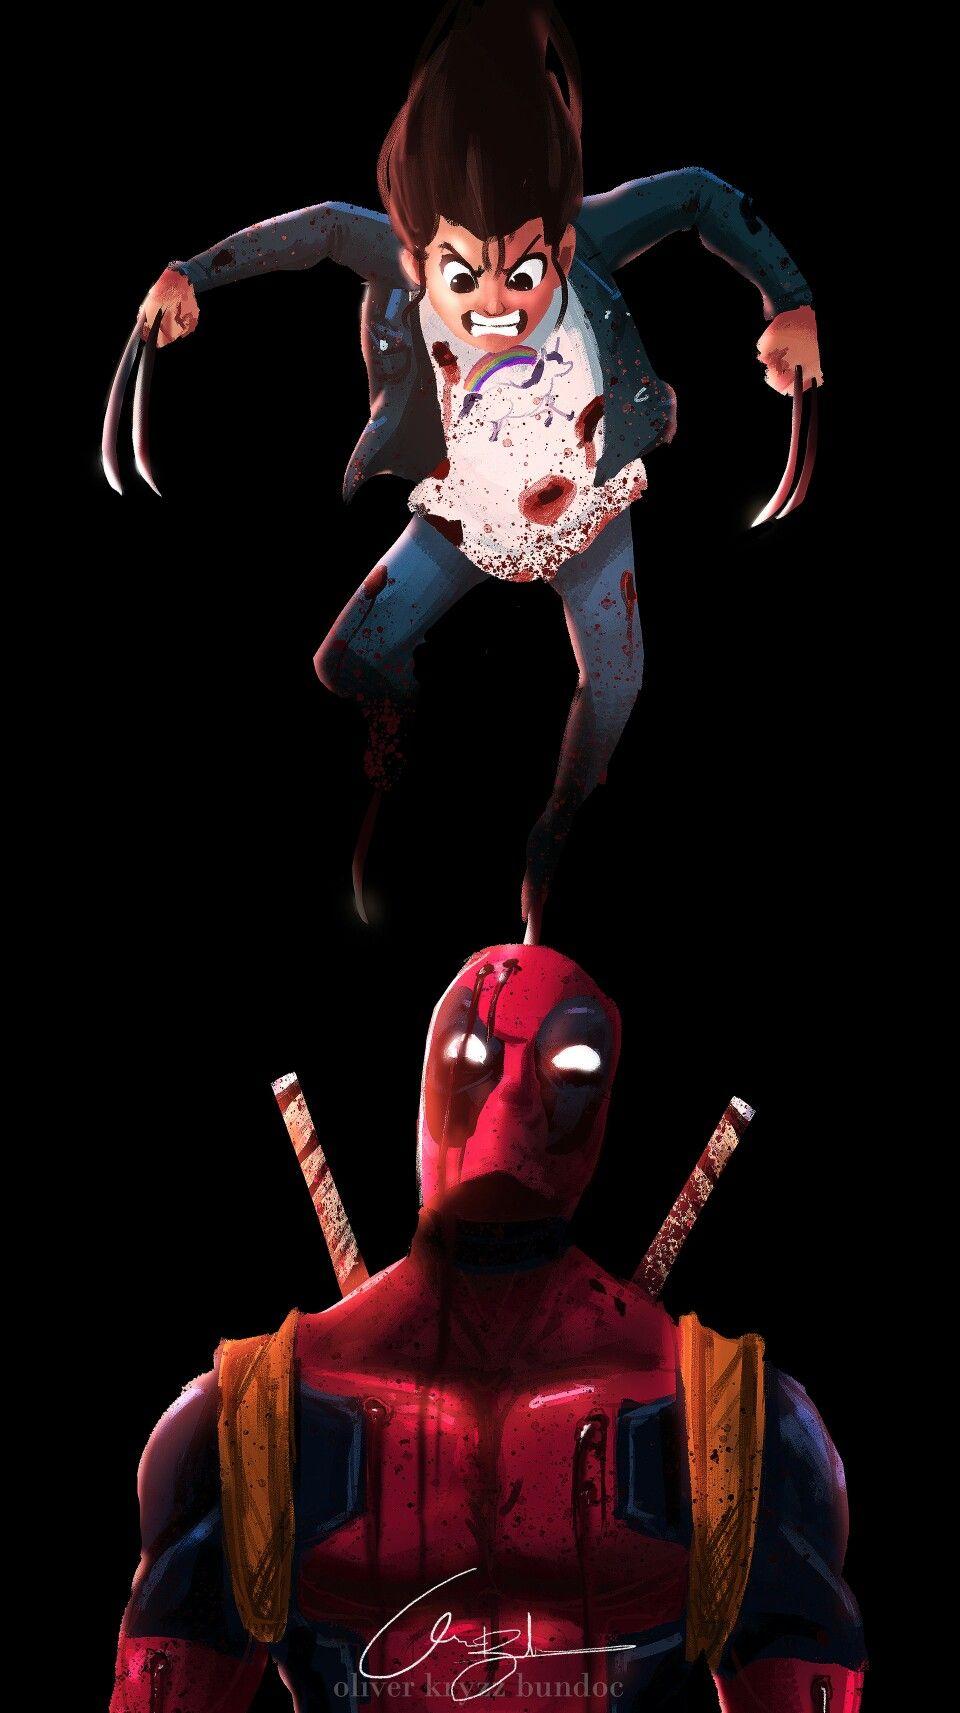 Artist Oliver Kryzz Bundoc Deadpool, Iphone wallpaper